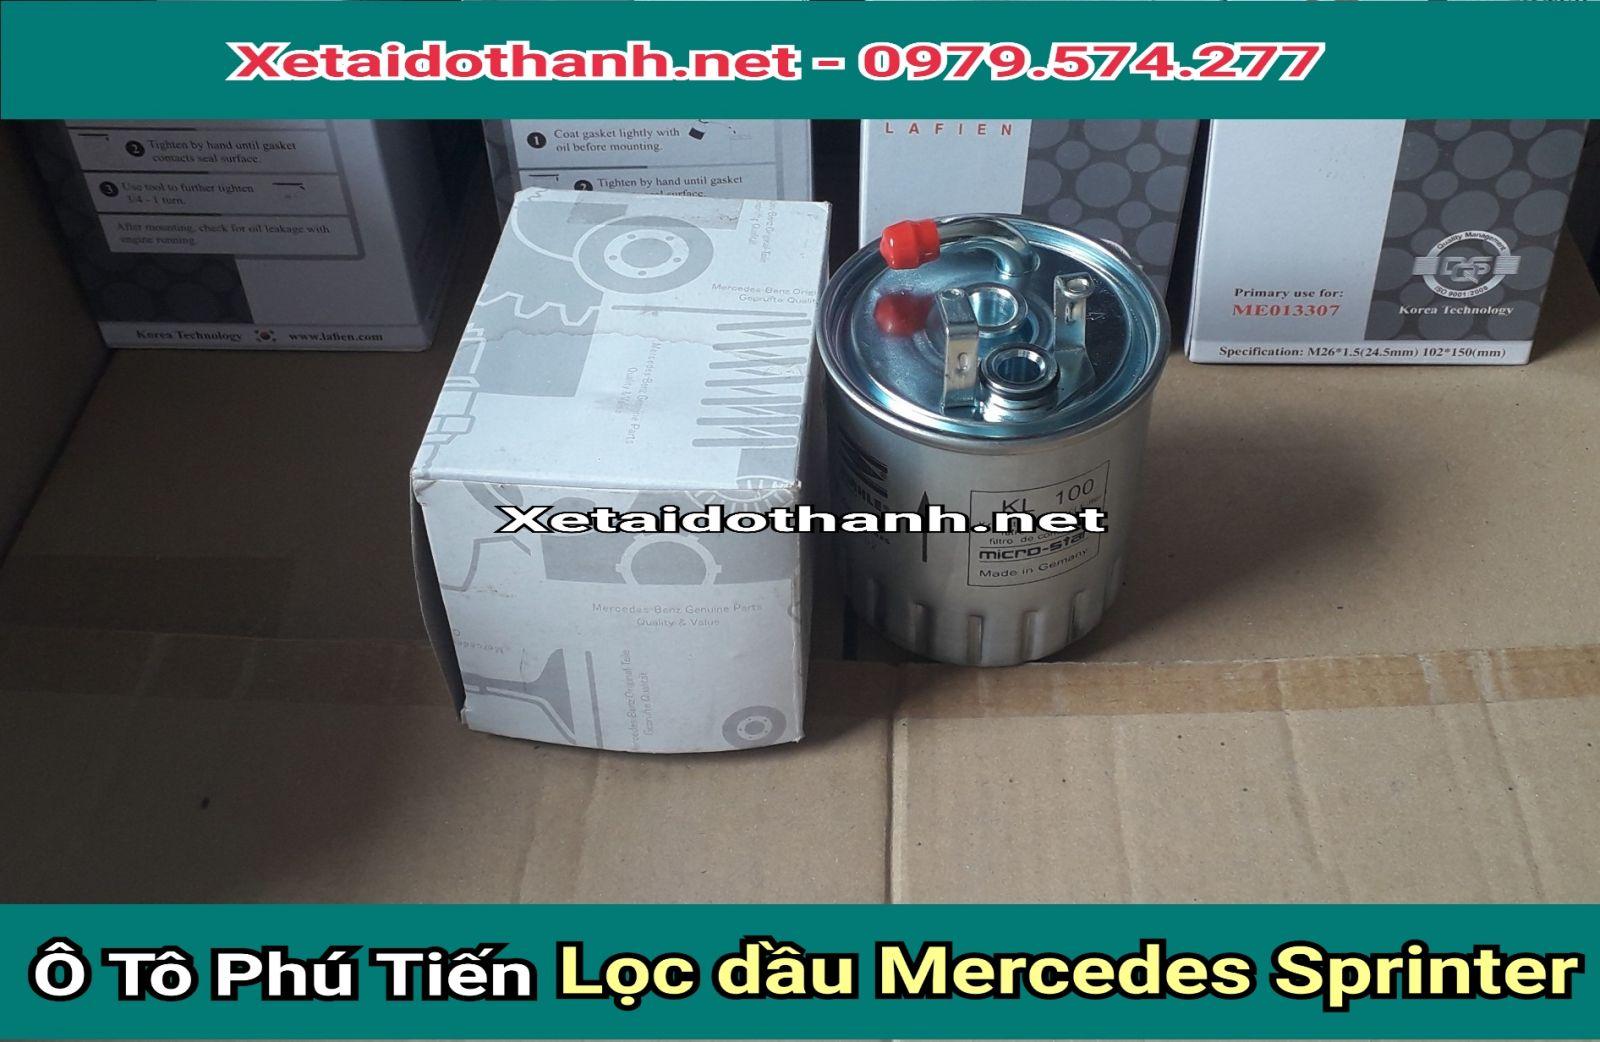 Lọc nhiên liệu Mercedes Sprinter